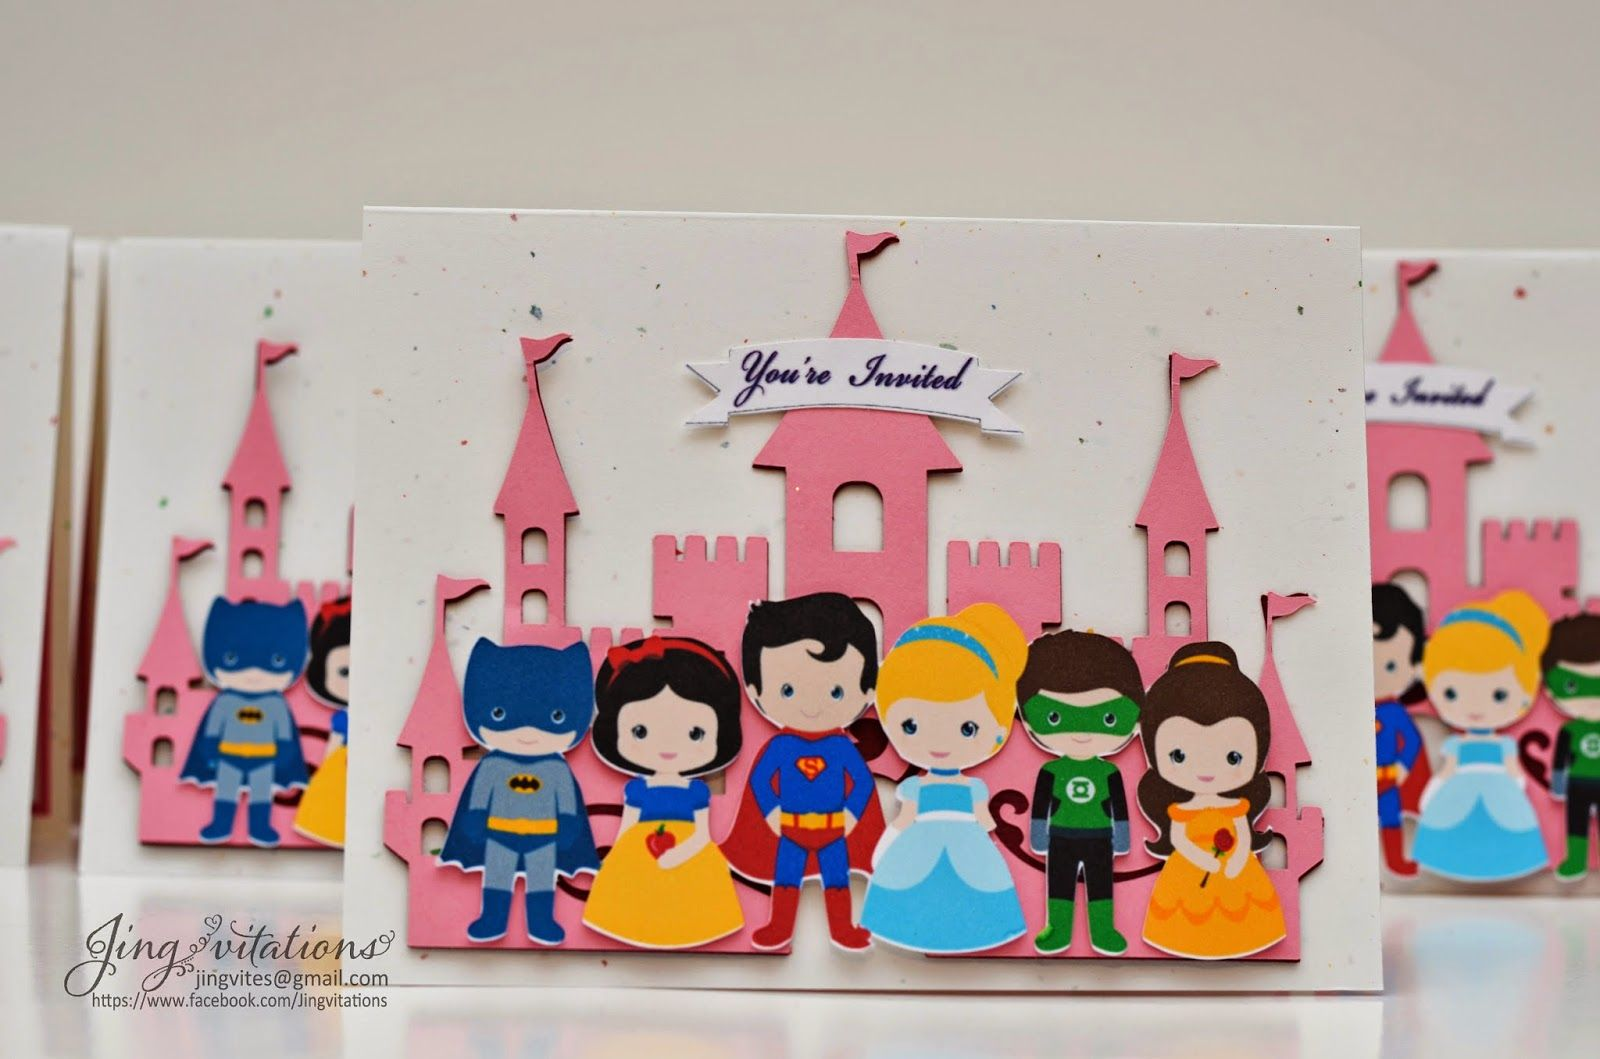 Superhero and Princess Party Invitations - Jingvitations ...